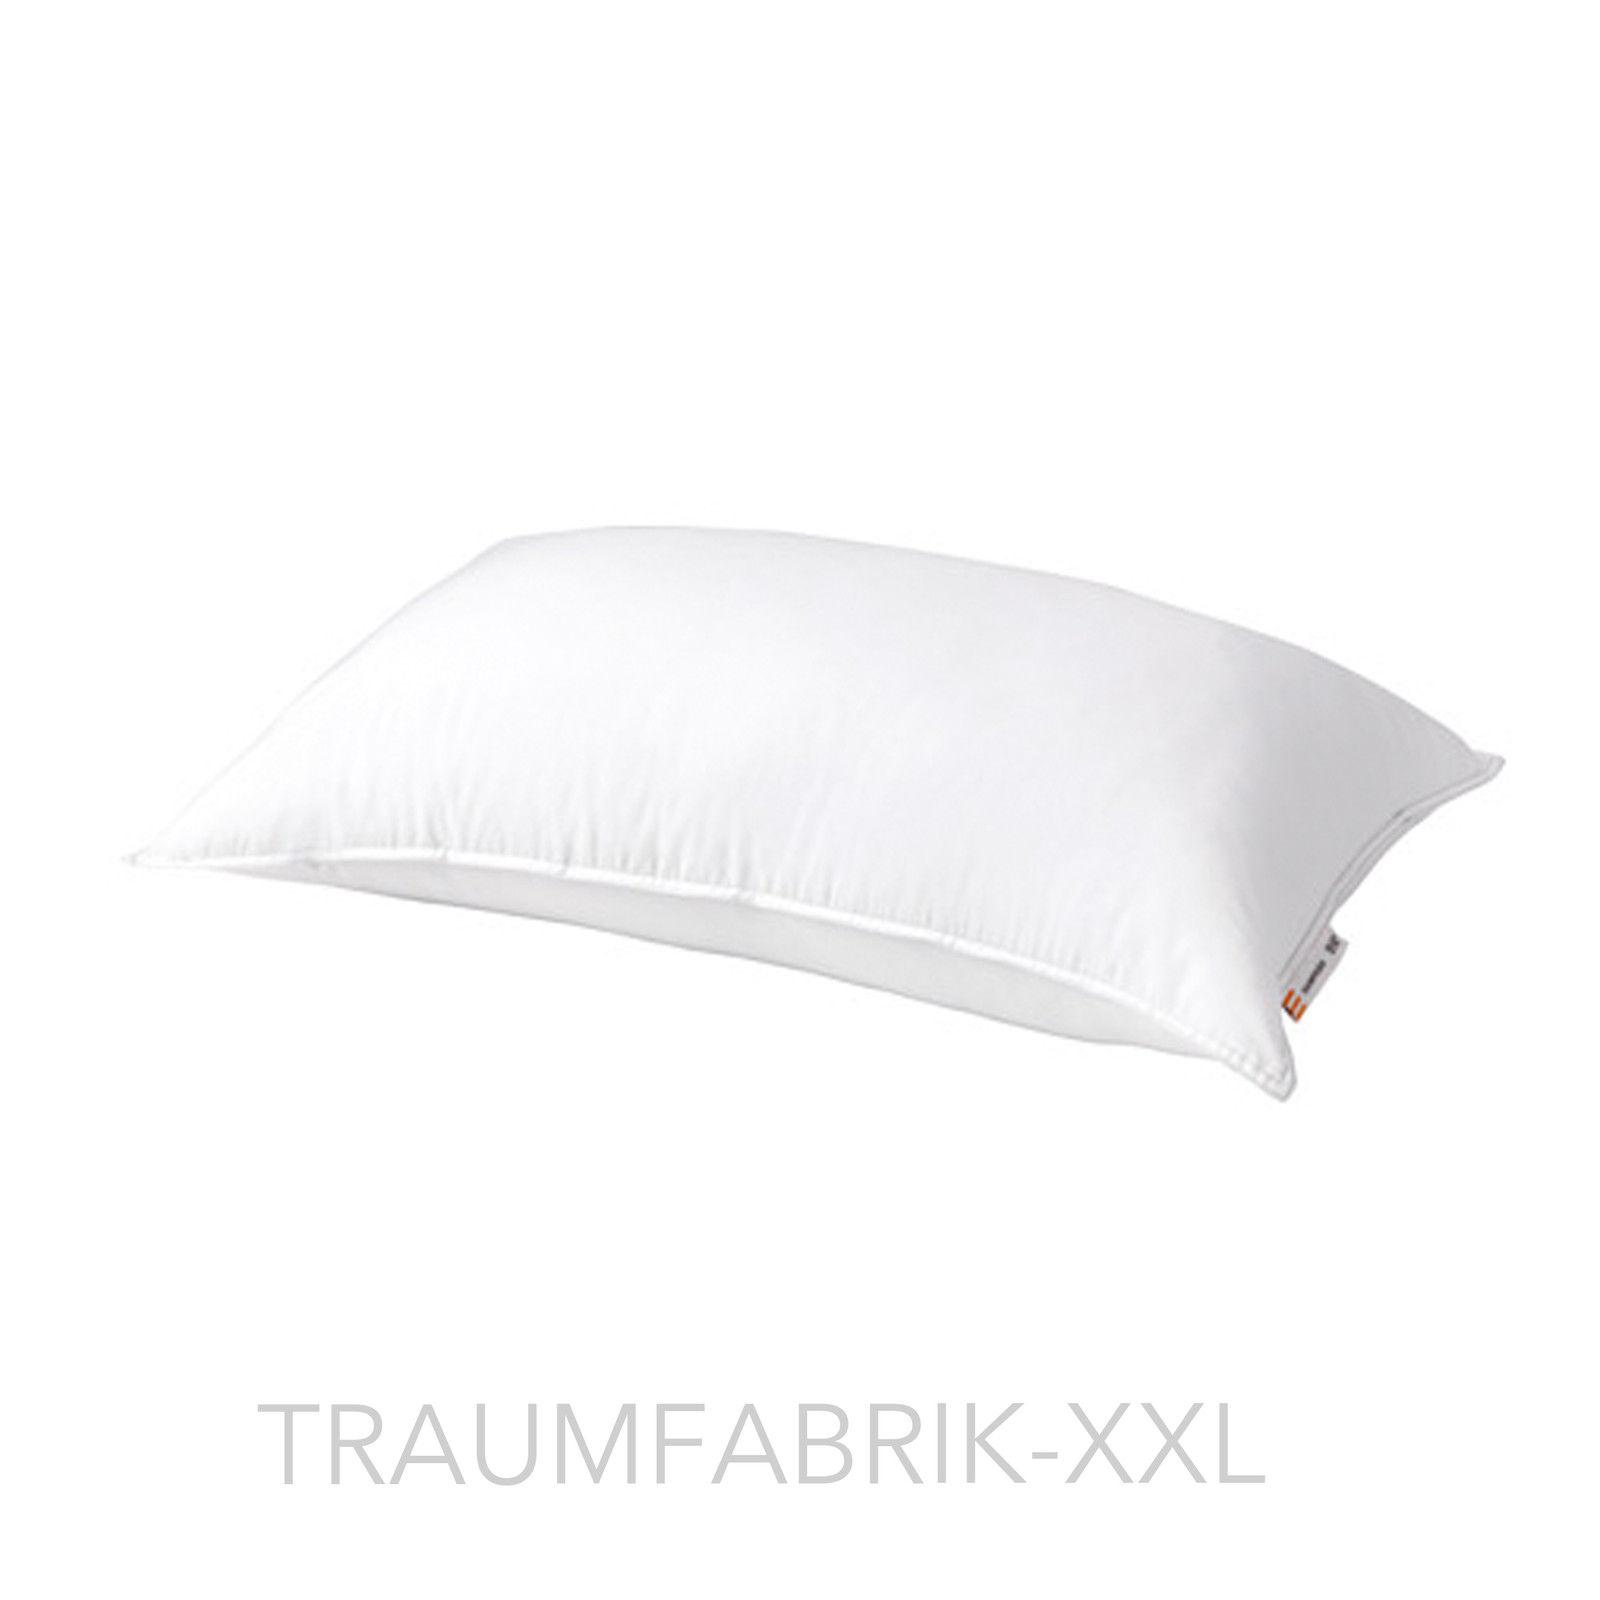 ikea kissenf llung fest kissen f llkissen inlett 40 x 80 cm 40 80 wei neu ovp traumfabrik xxl. Black Bedroom Furniture Sets. Home Design Ideas